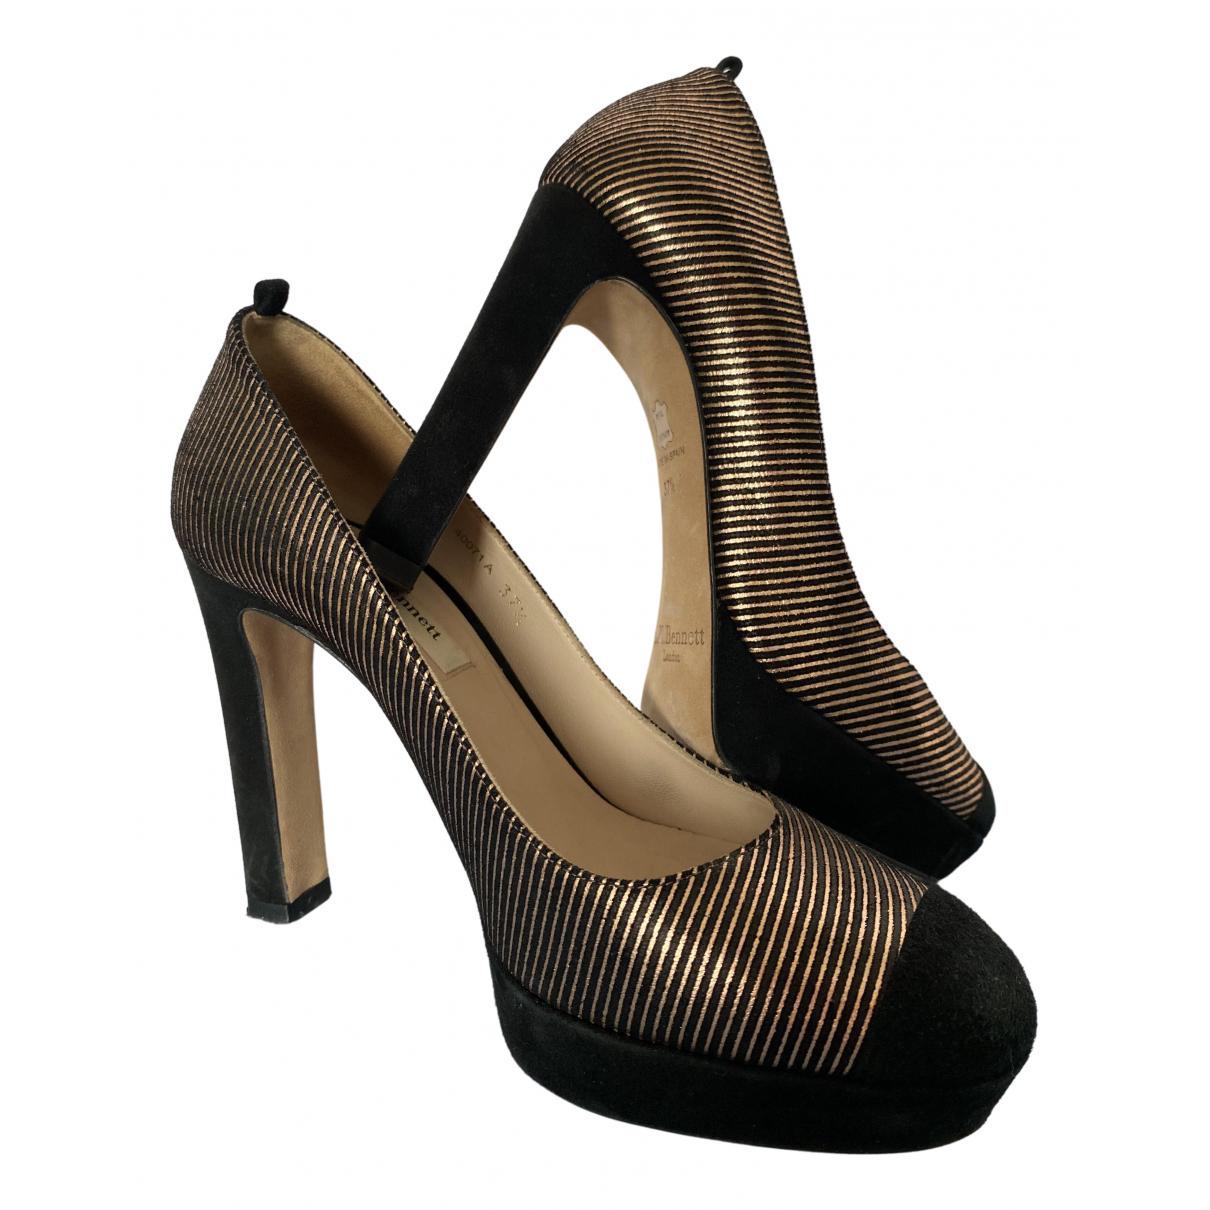 Lk Bennett \N Black Suede Heels for Women 37.5 EU